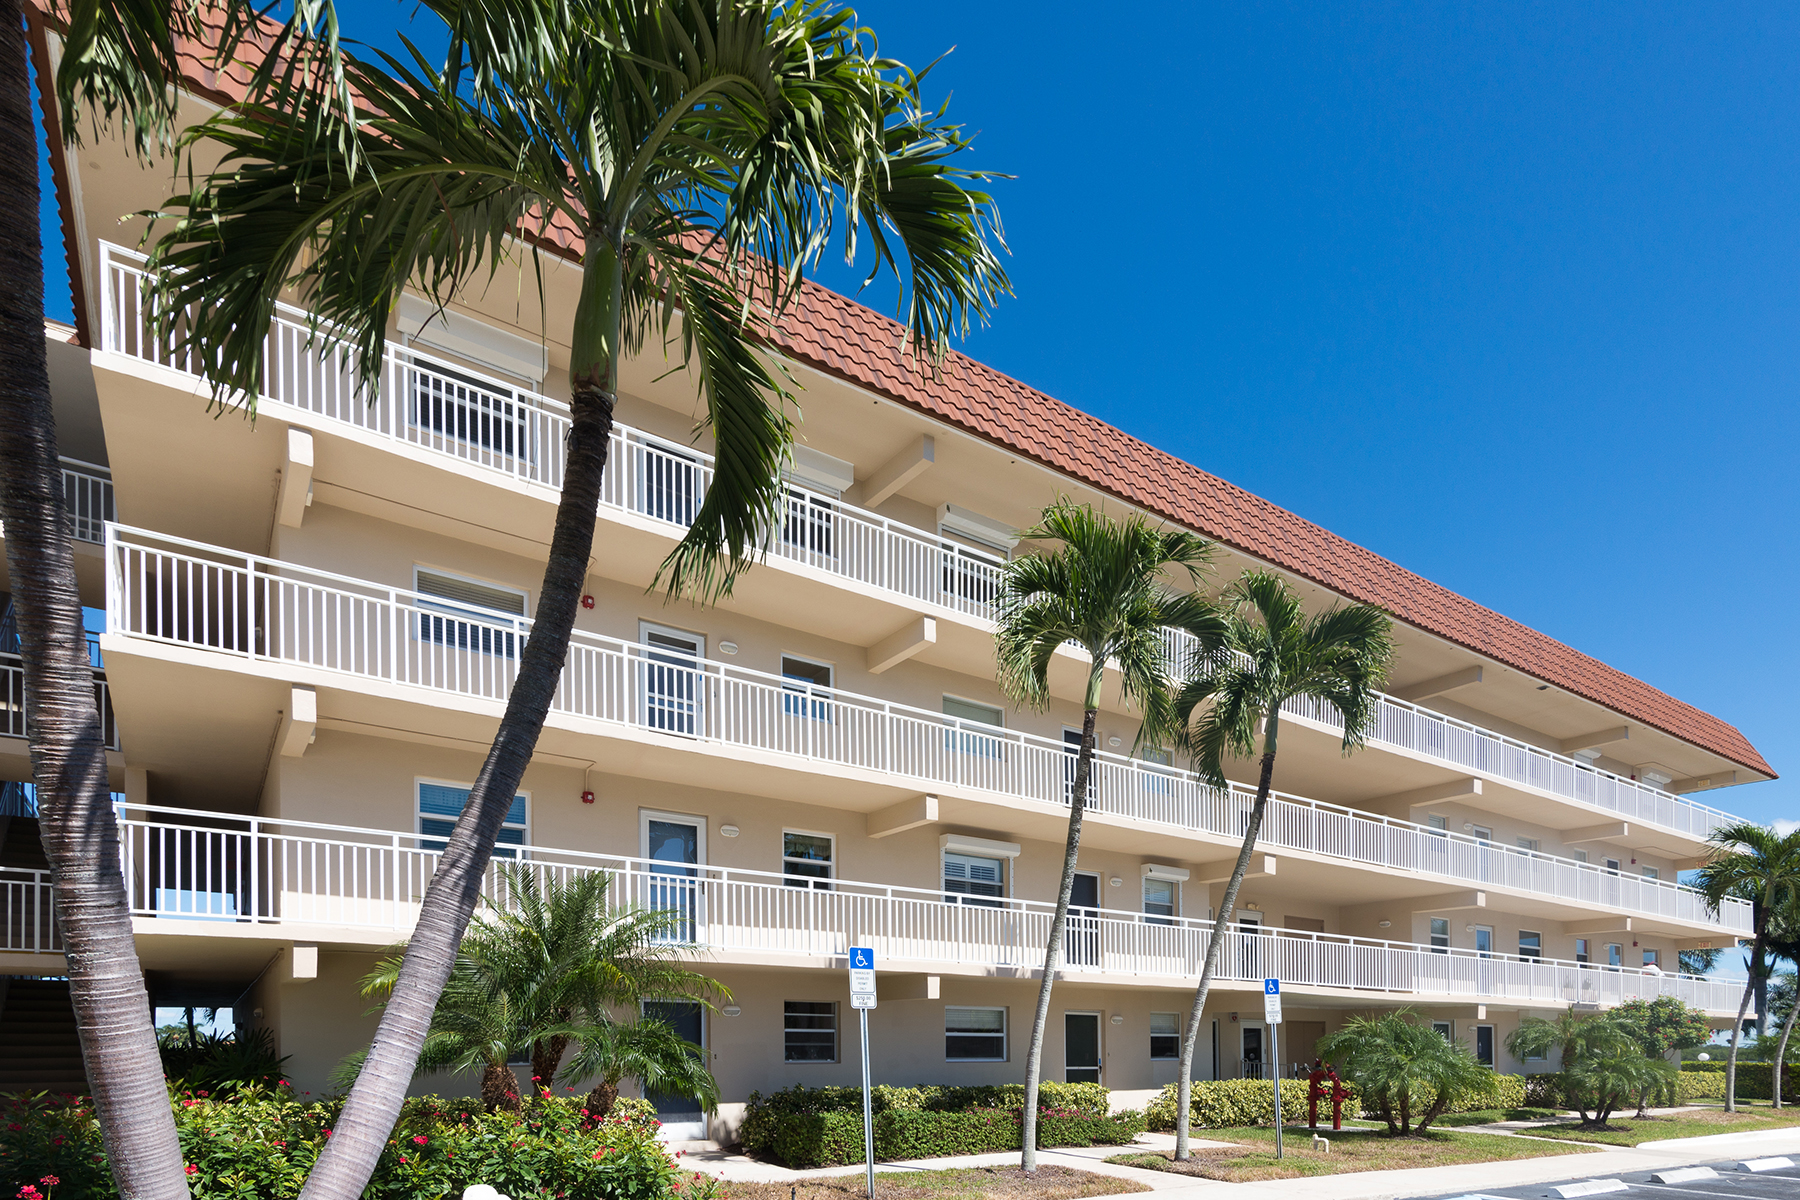 Condominium for Sale at MARCO ISLAND - VILLE DE MARCO 1200 Edington Pl 103 Marco Island, Florida 34145 United States